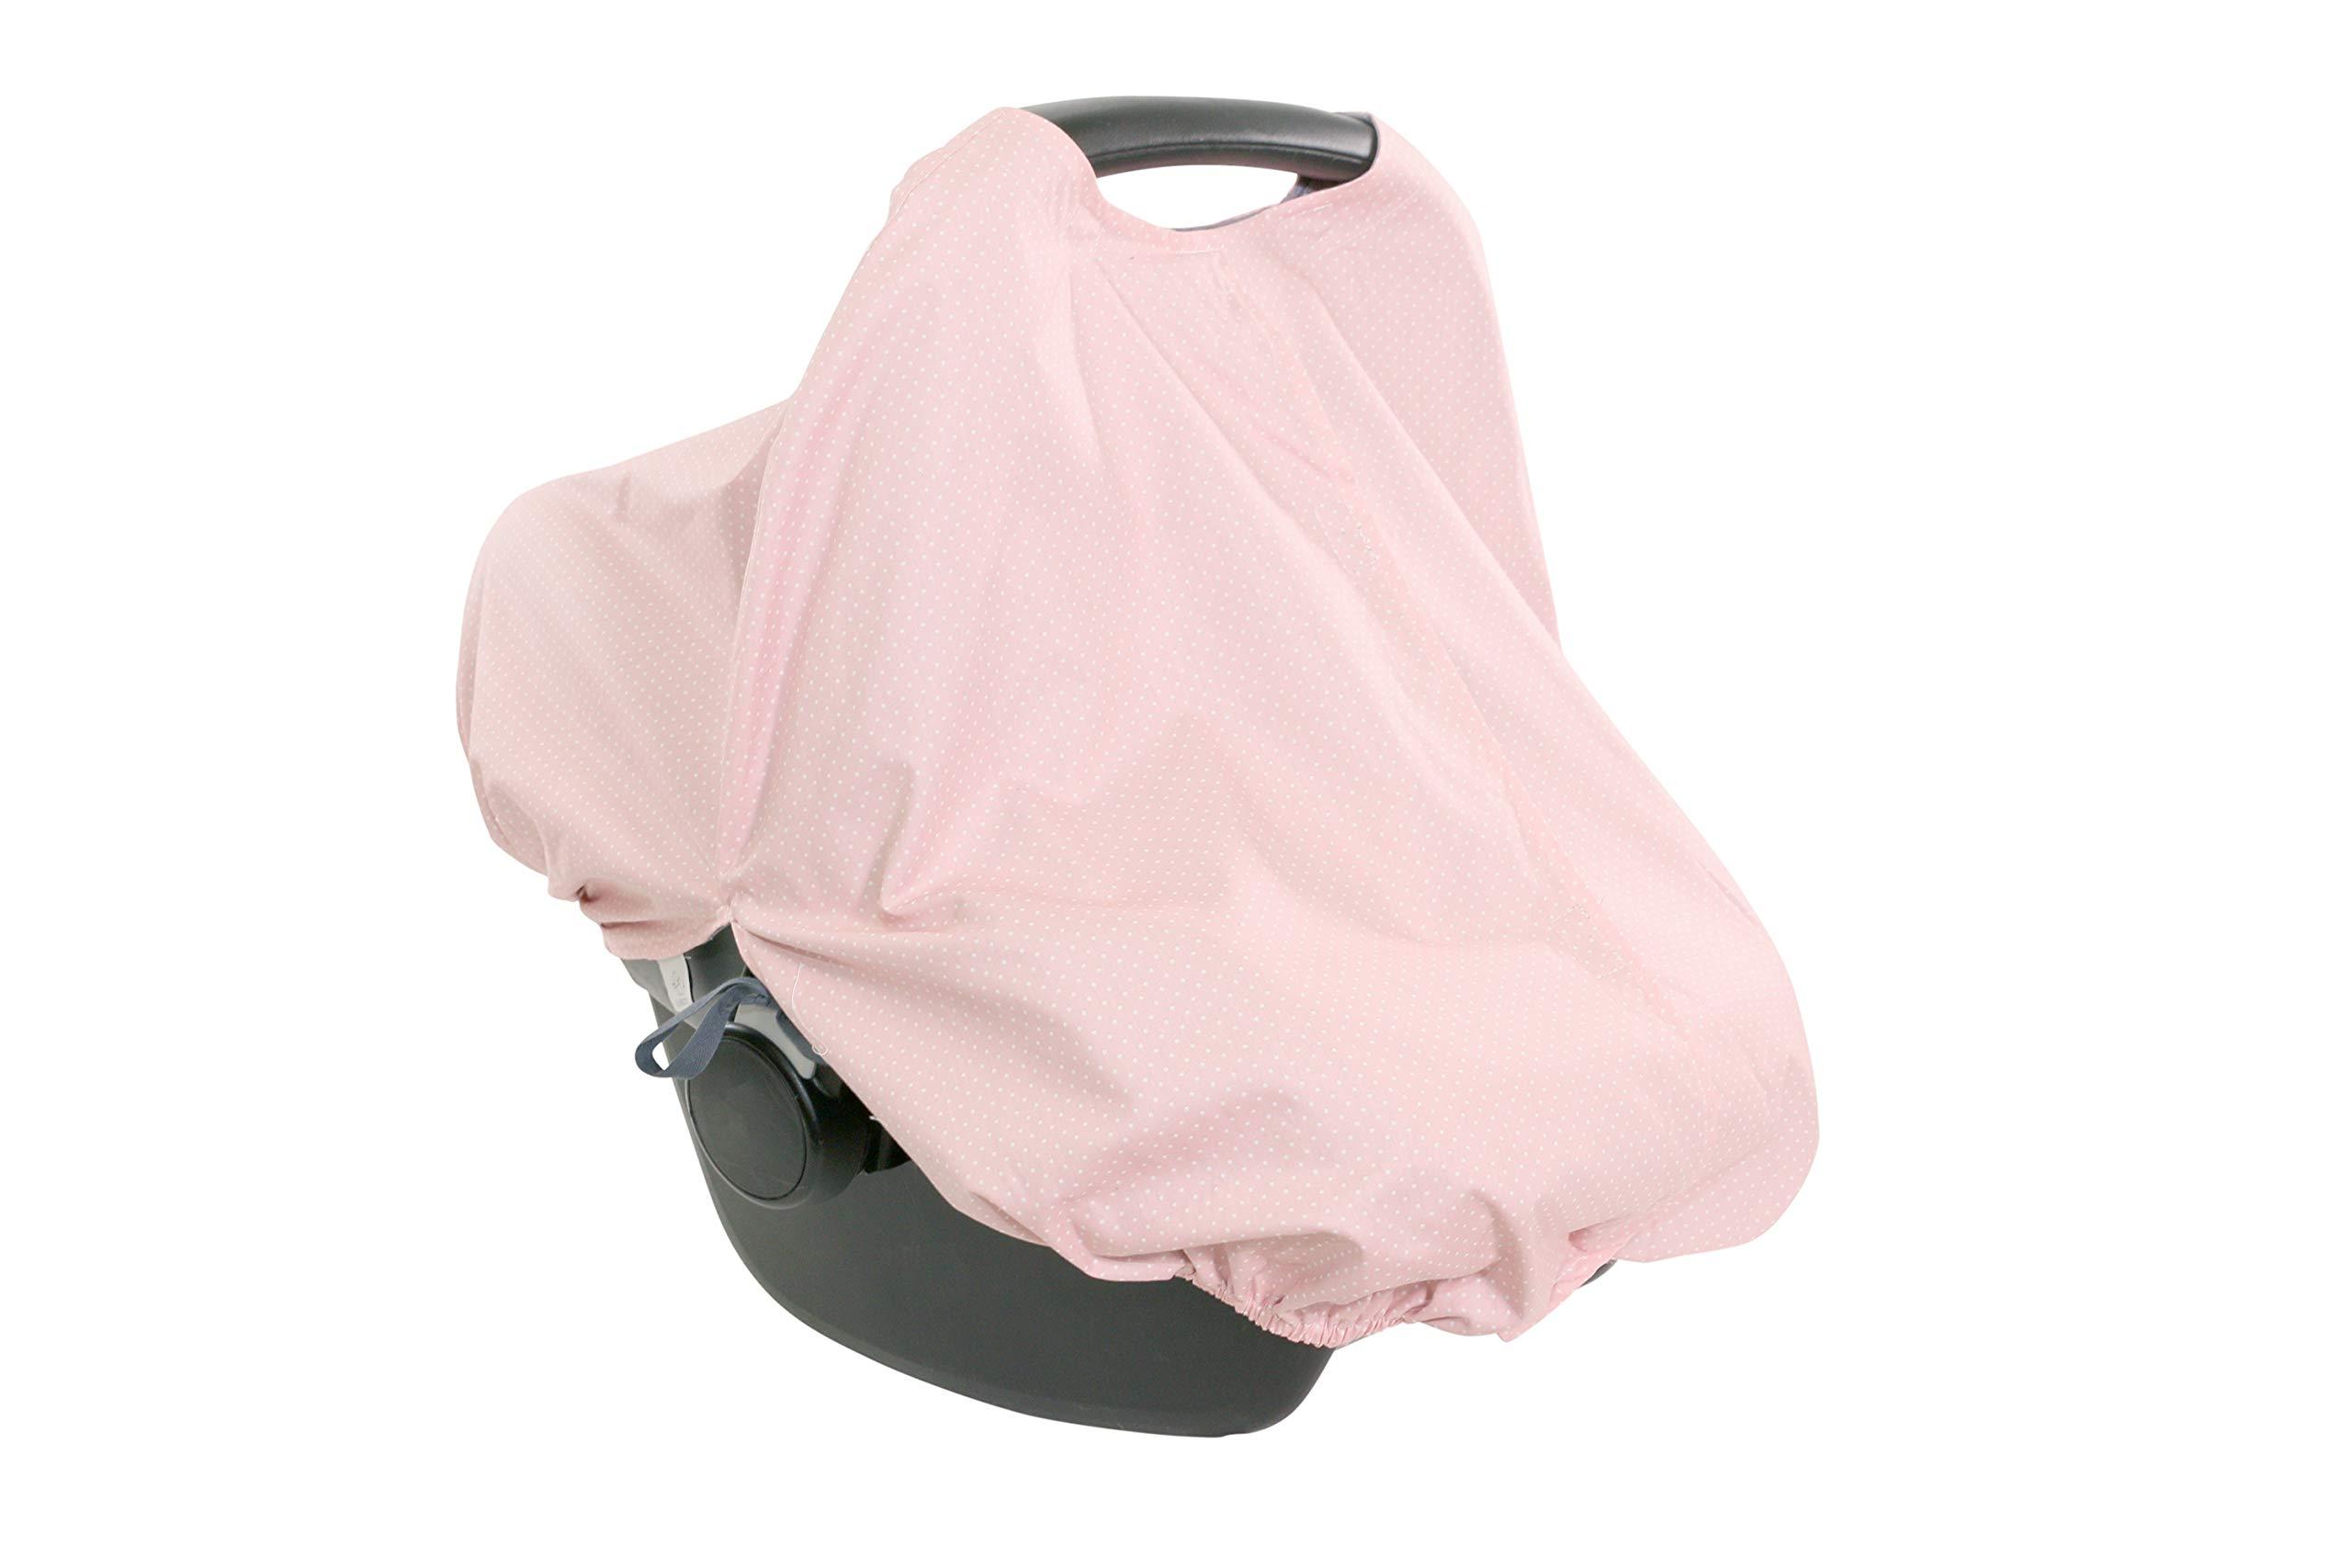 100% Cotton Nursing Cover by ULLENBOOM   Multi-Use Breastfeeding Scarf/Shawl   Girls Pink